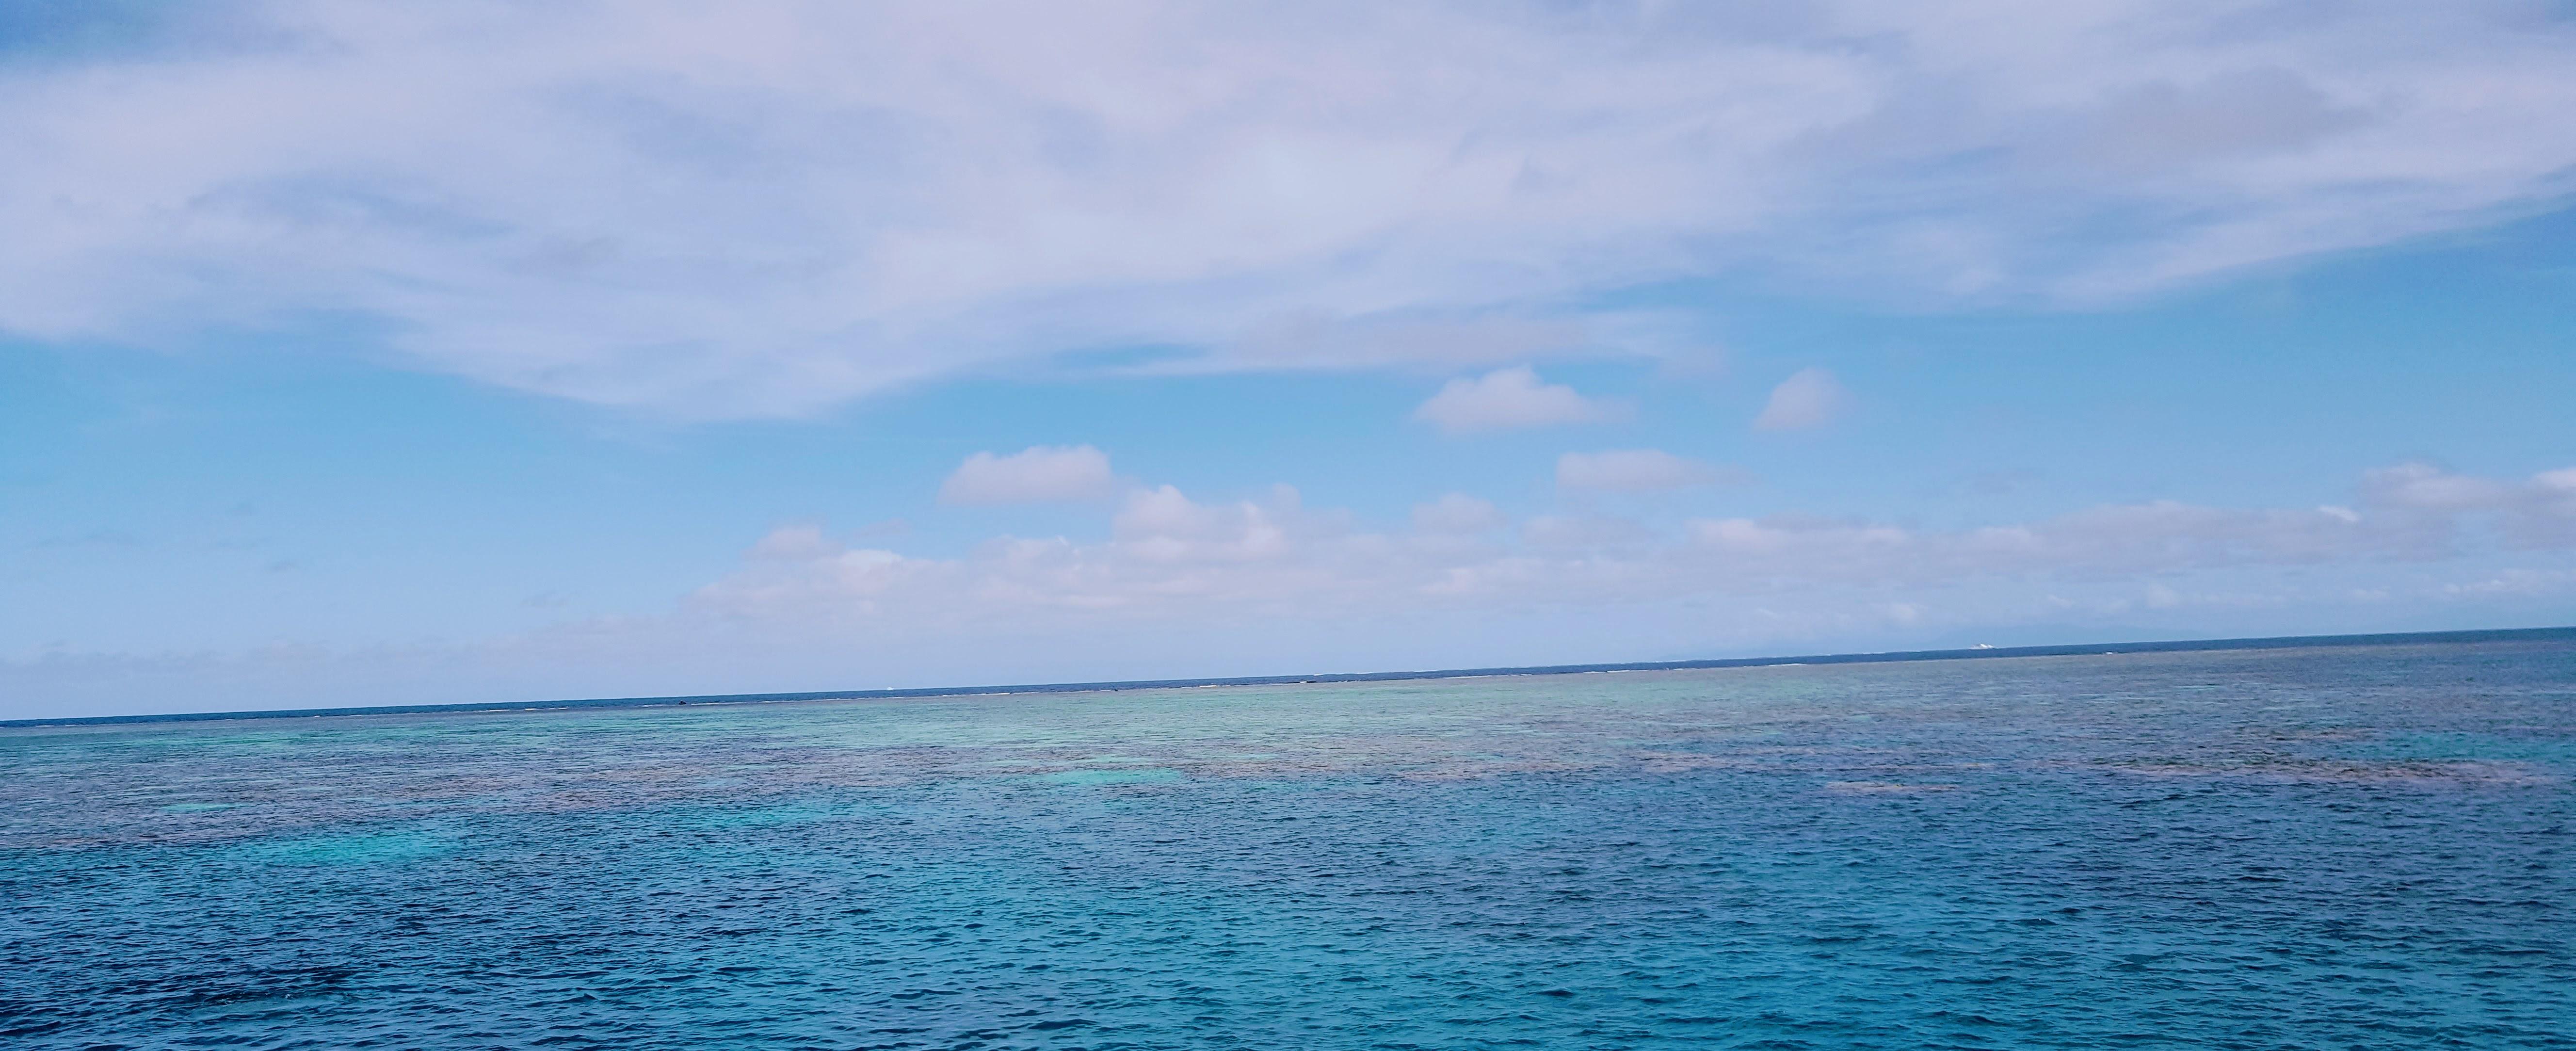 Cairns, Queensland, Australia – 3 Day Trip